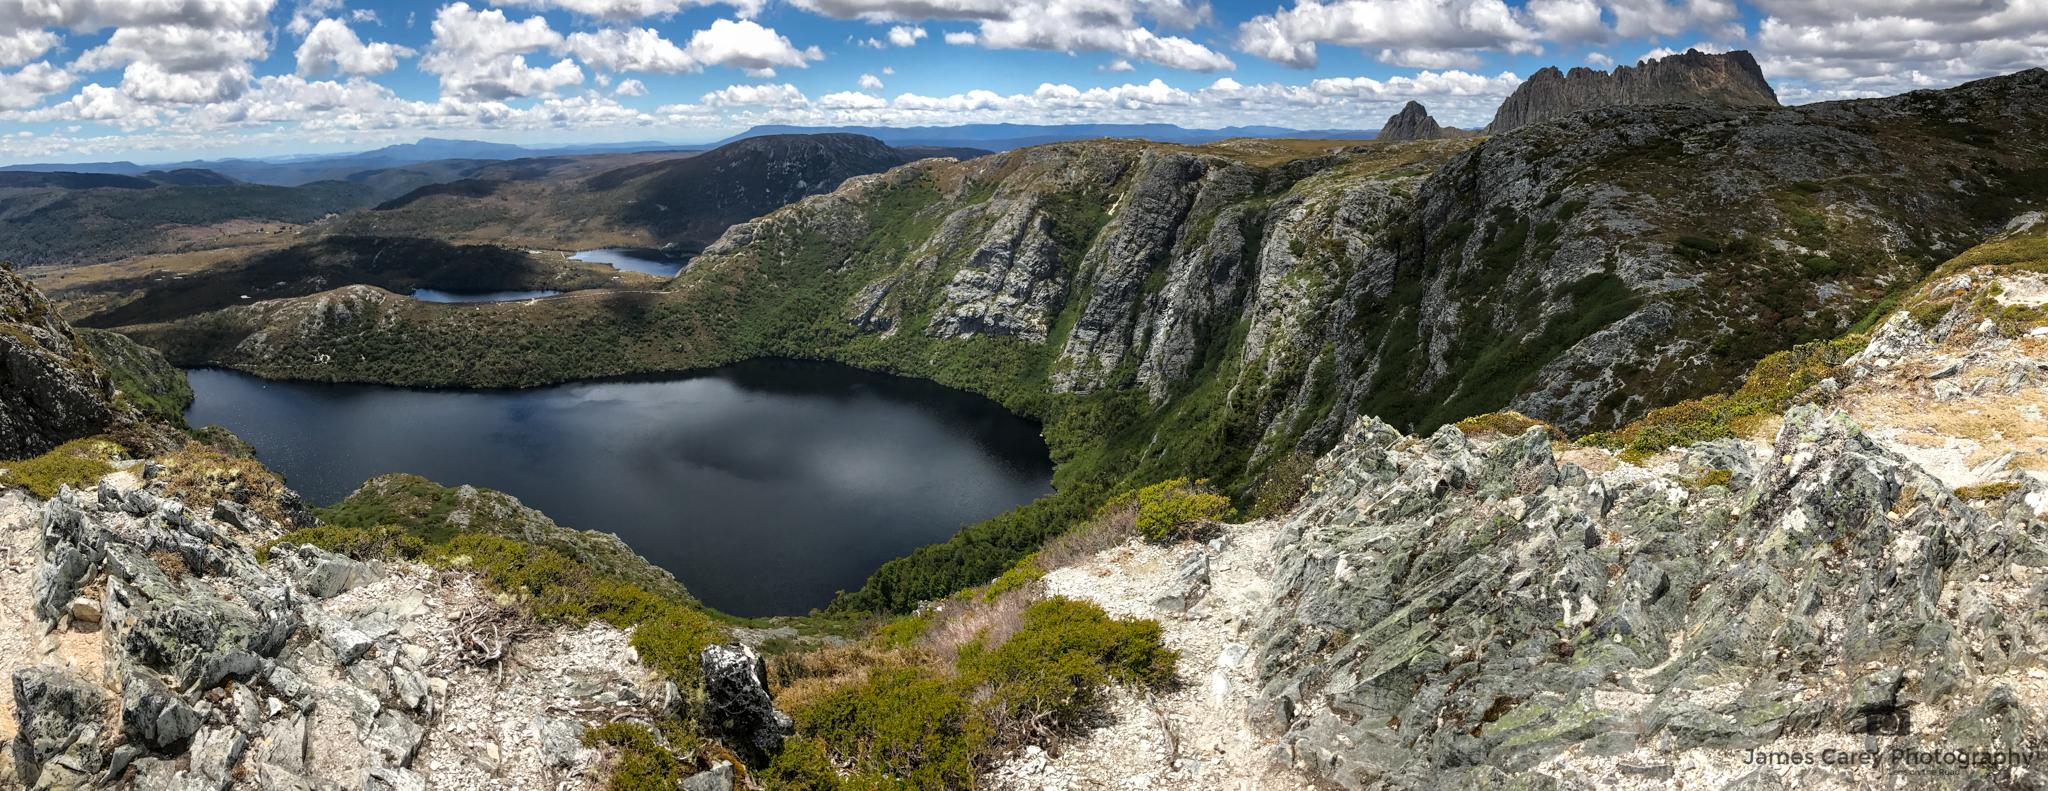 LONR - Tasmania-8.jpg